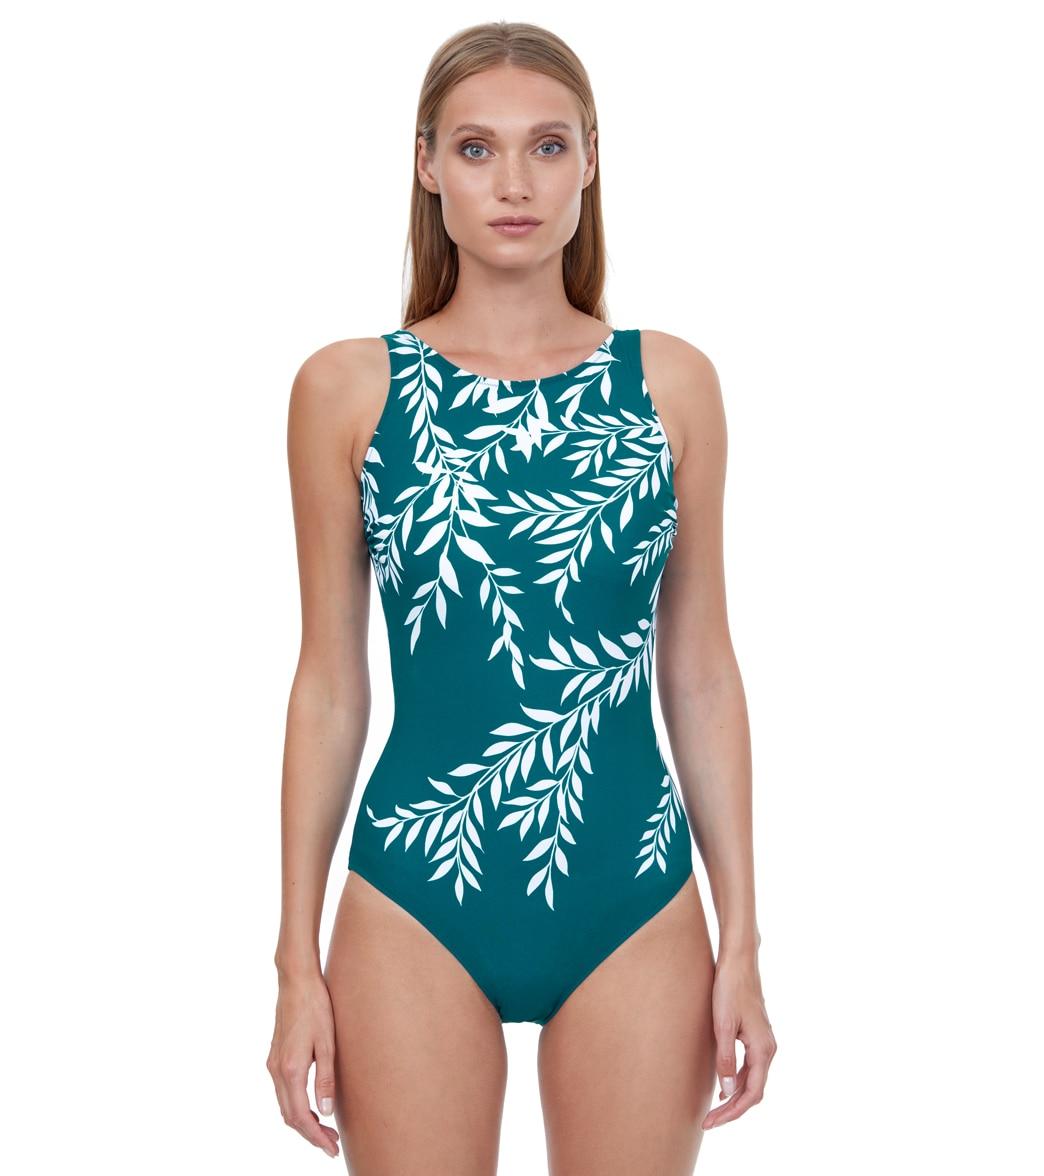 Gottex Women's Portofino Mastectomy High Neck One Piece Swimsuit